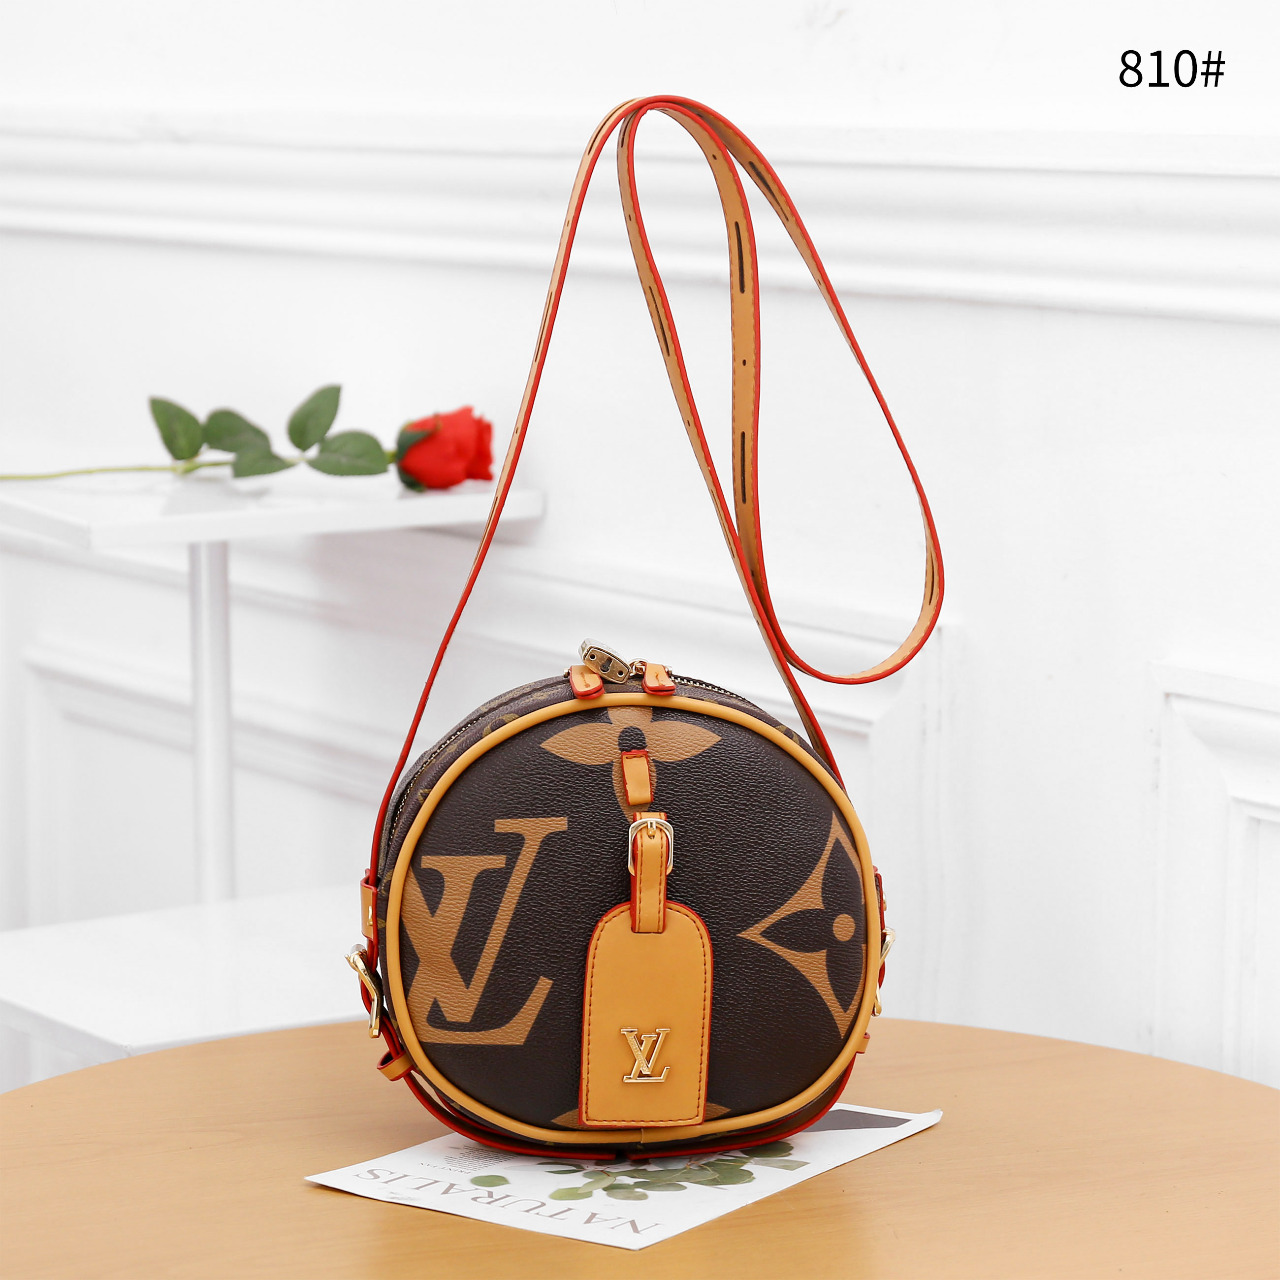 Louis Vuitton Giant Monogram bag 2020 2021 2022